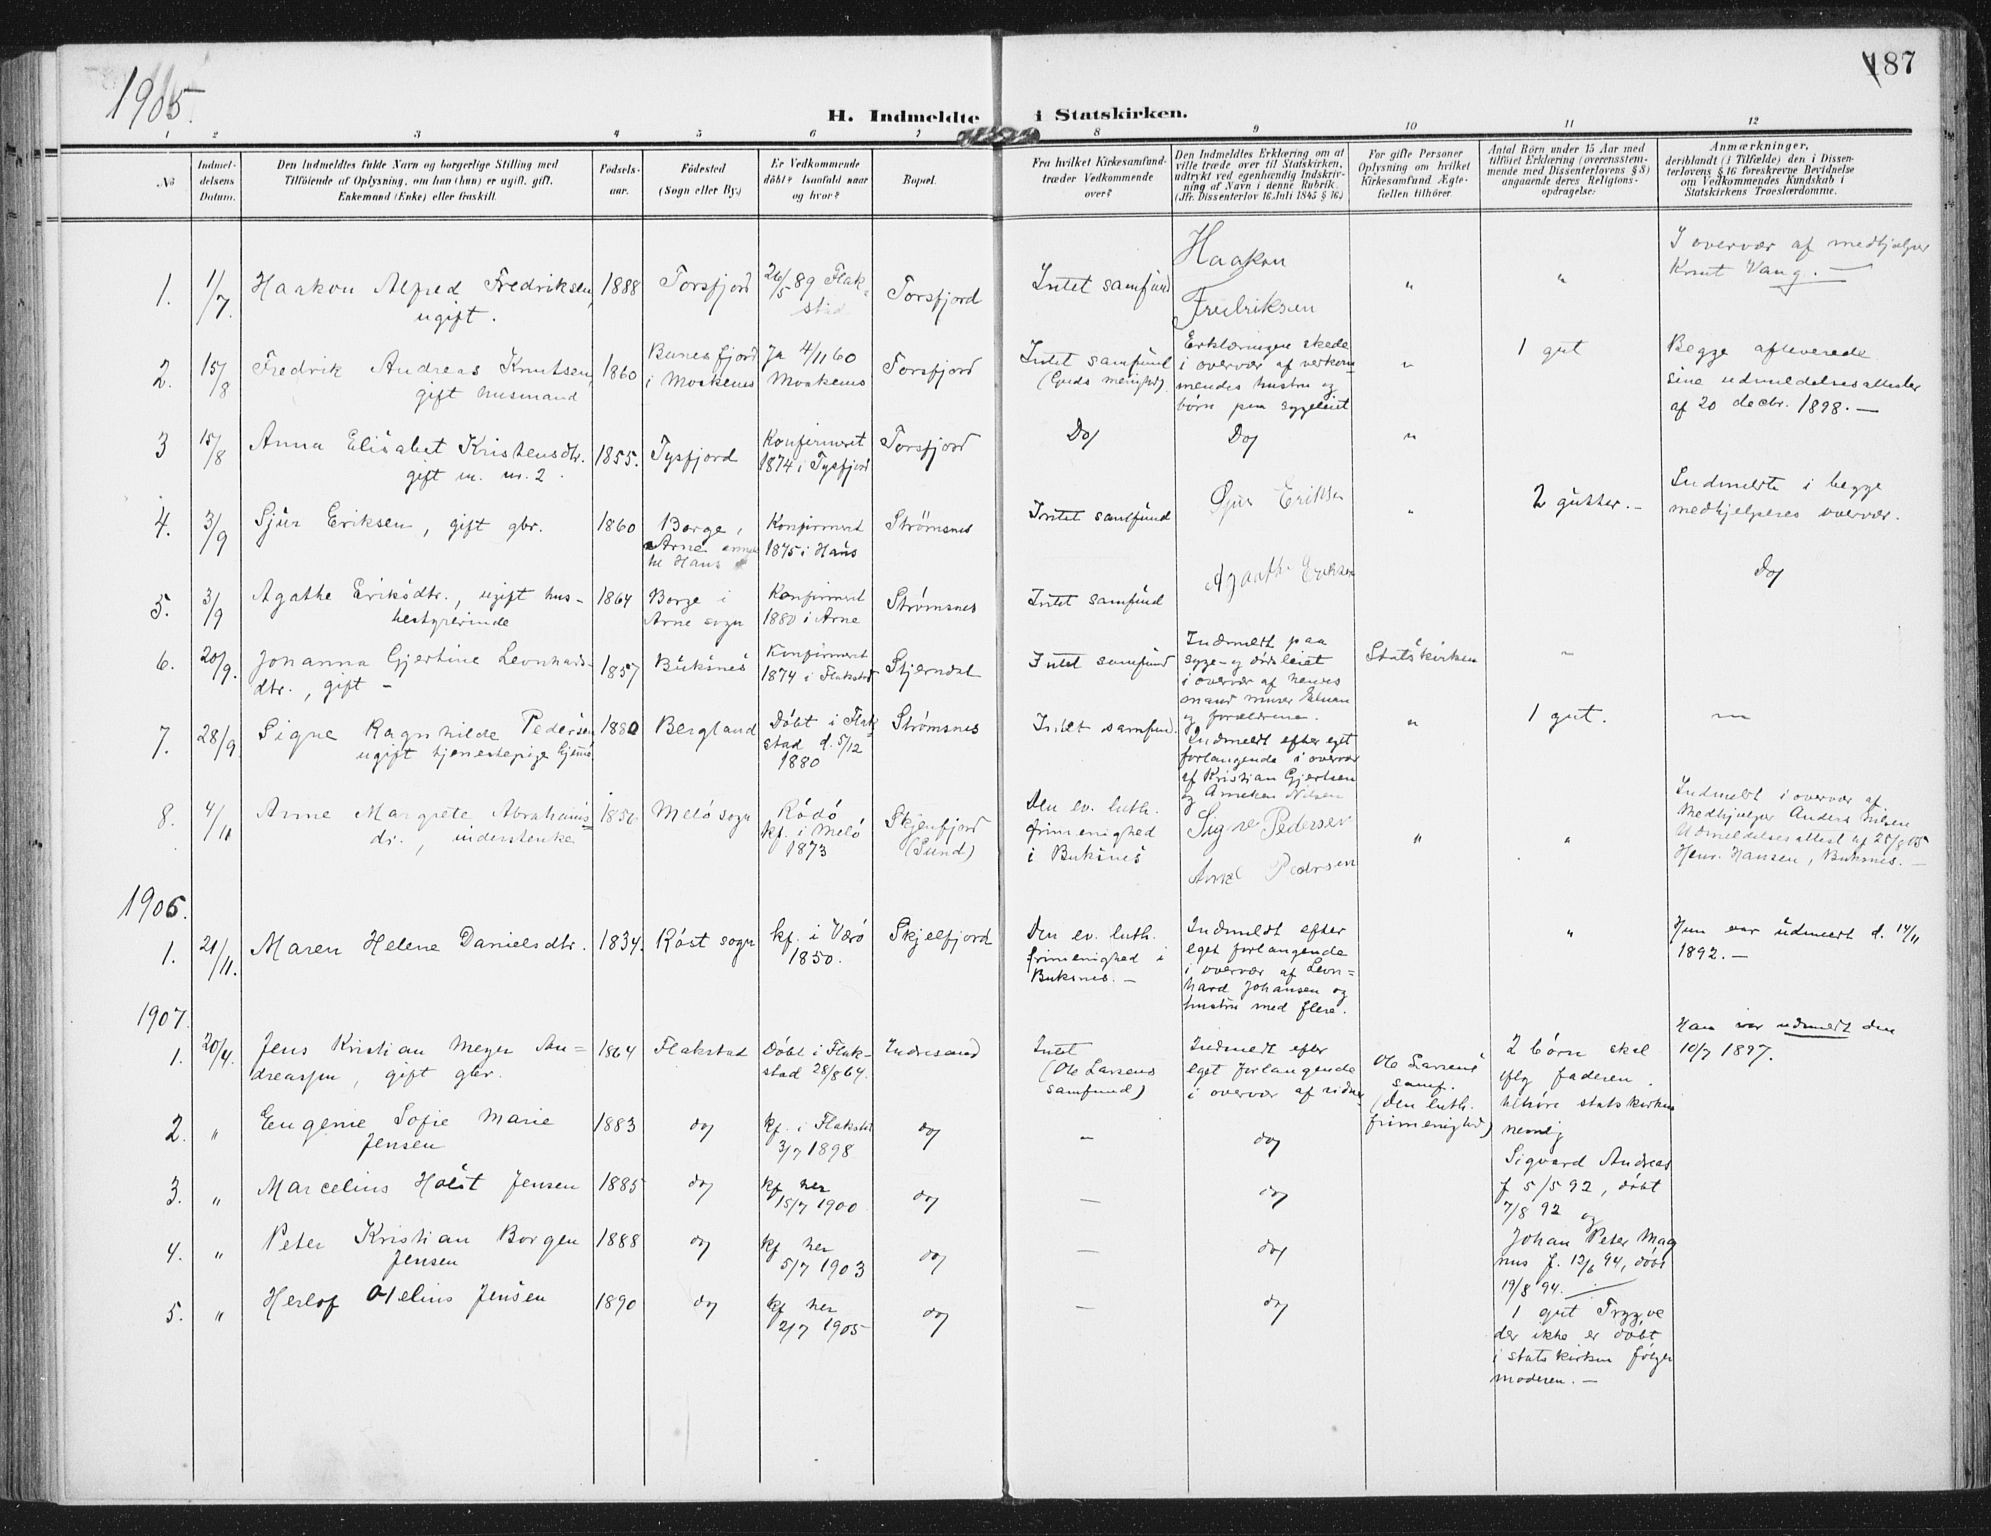 SAT, Ministerialprotokoller, klokkerbøker og fødselsregistre - Nordland, 885/L1206: Ministerialbok nr. 885A07, 1905-1915, s. 187